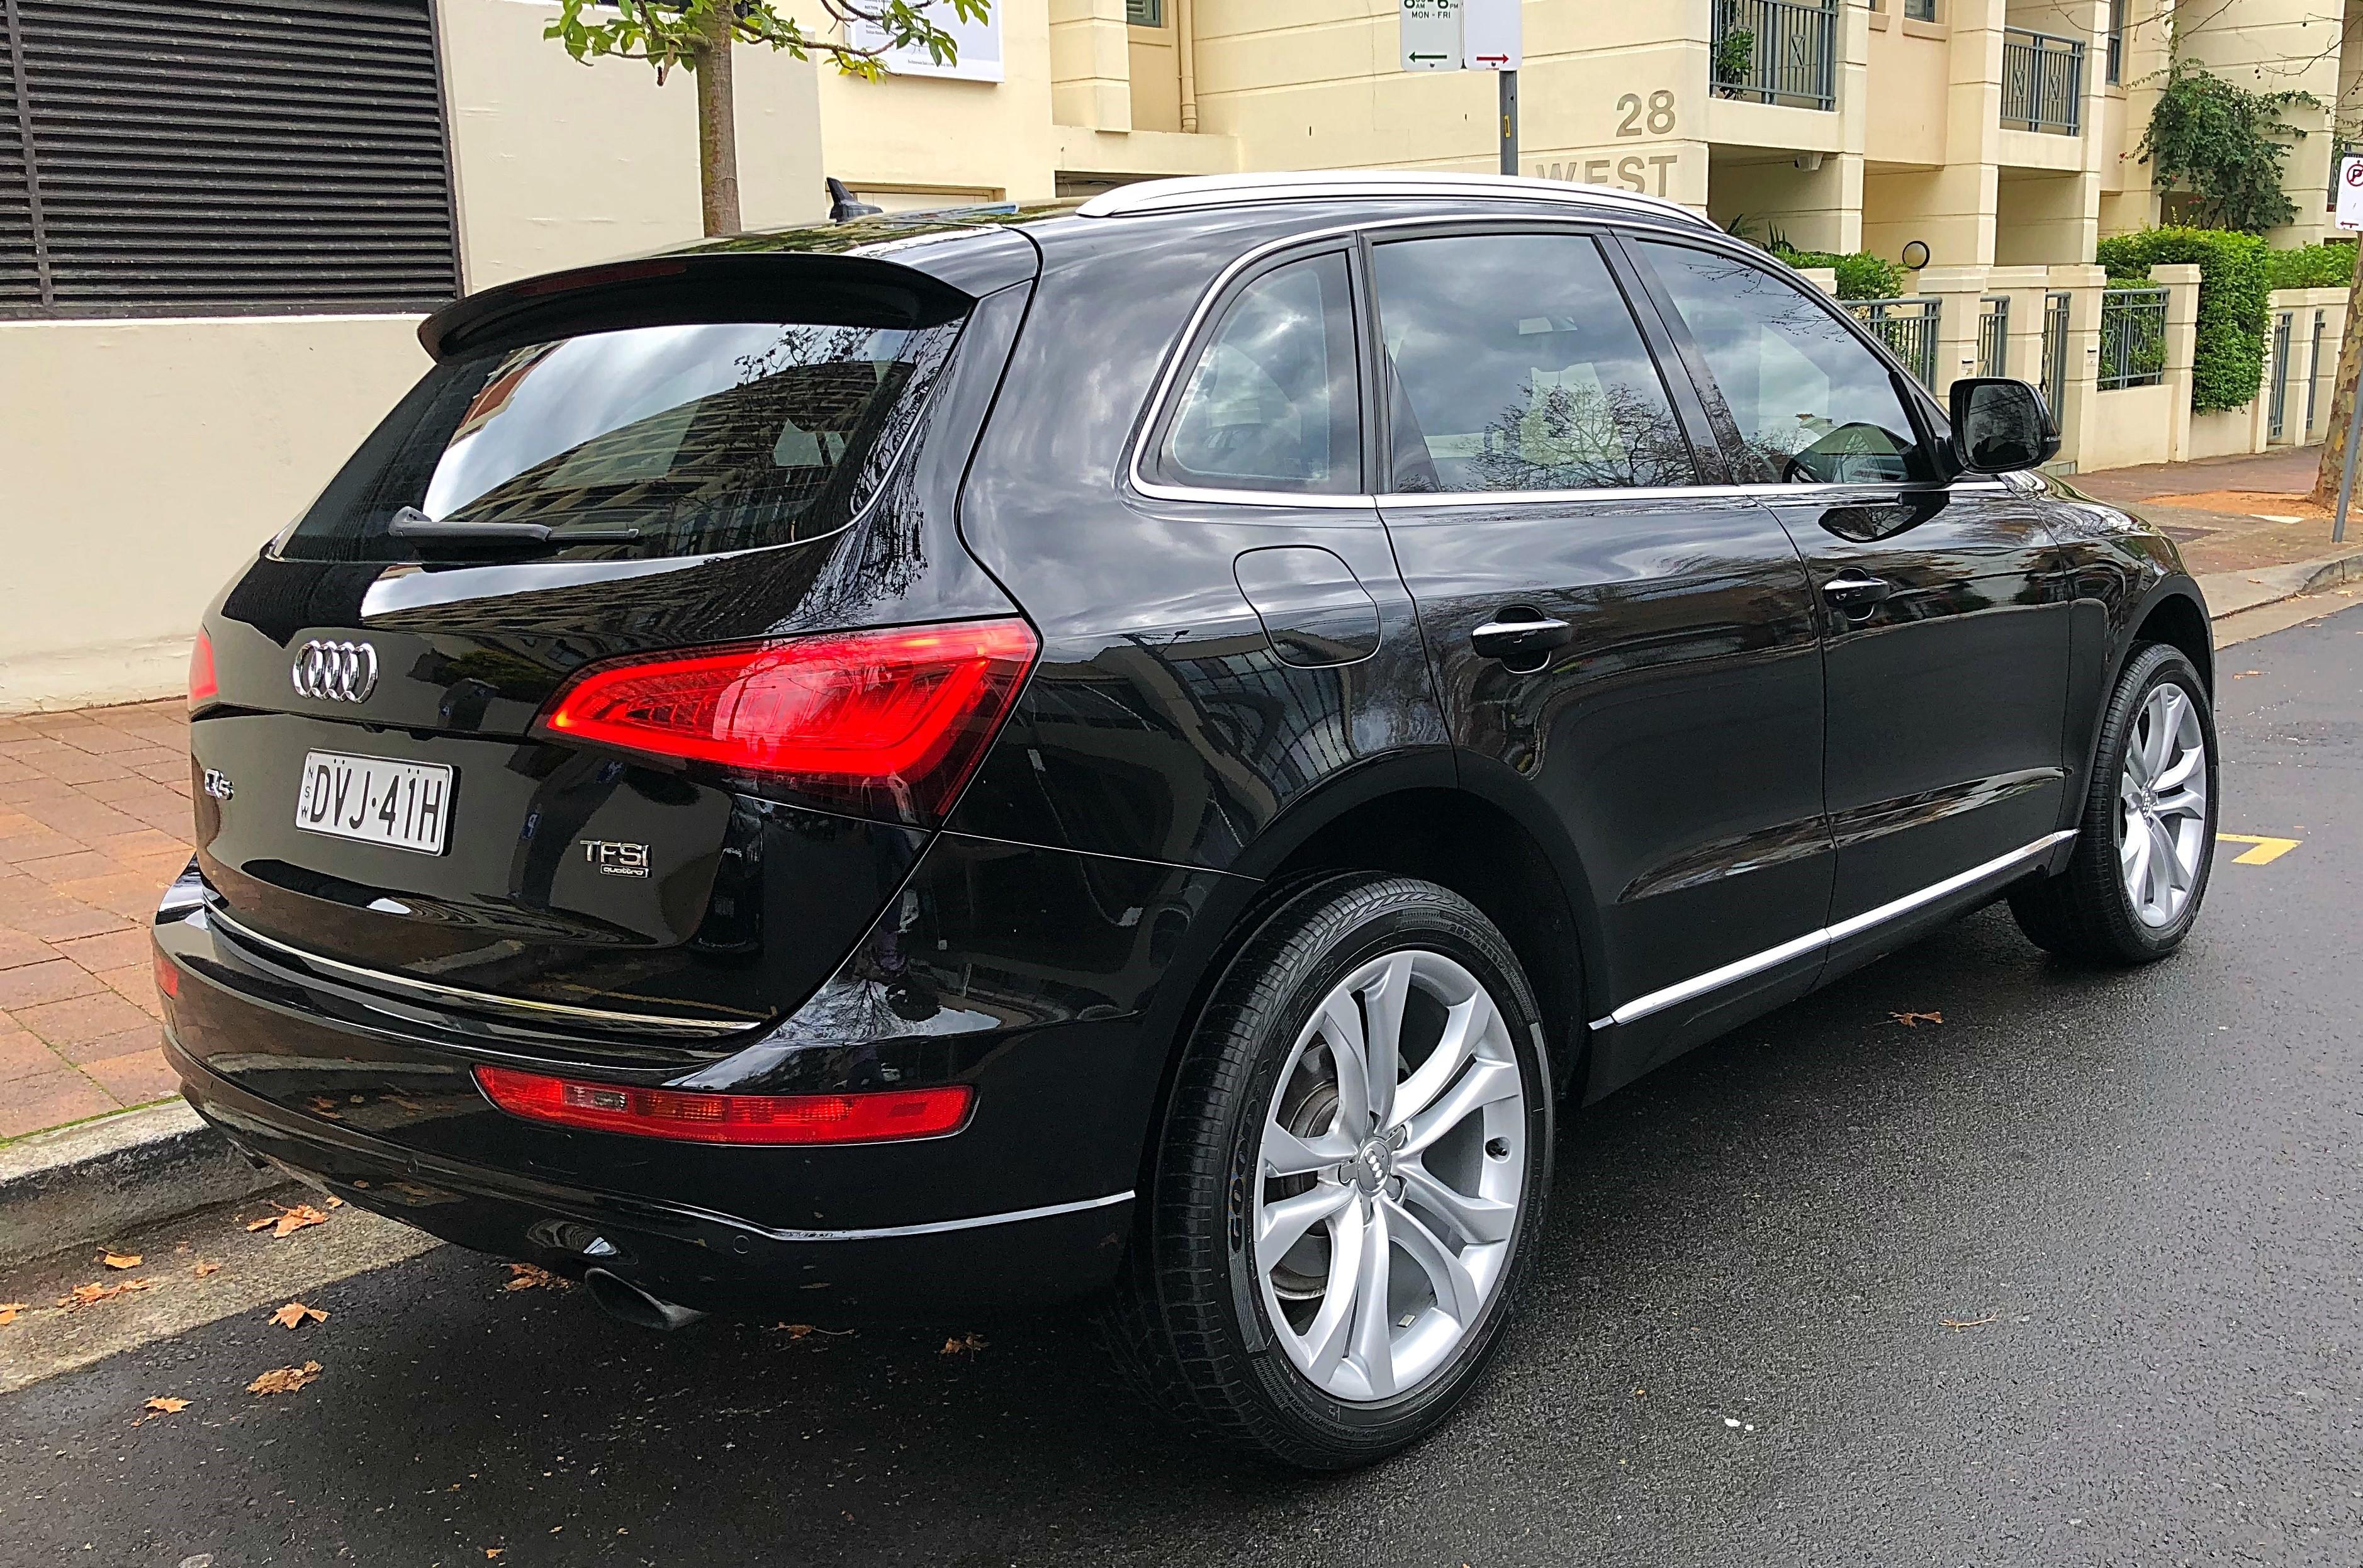 Picture of Mathew's 2014 Audi Q5